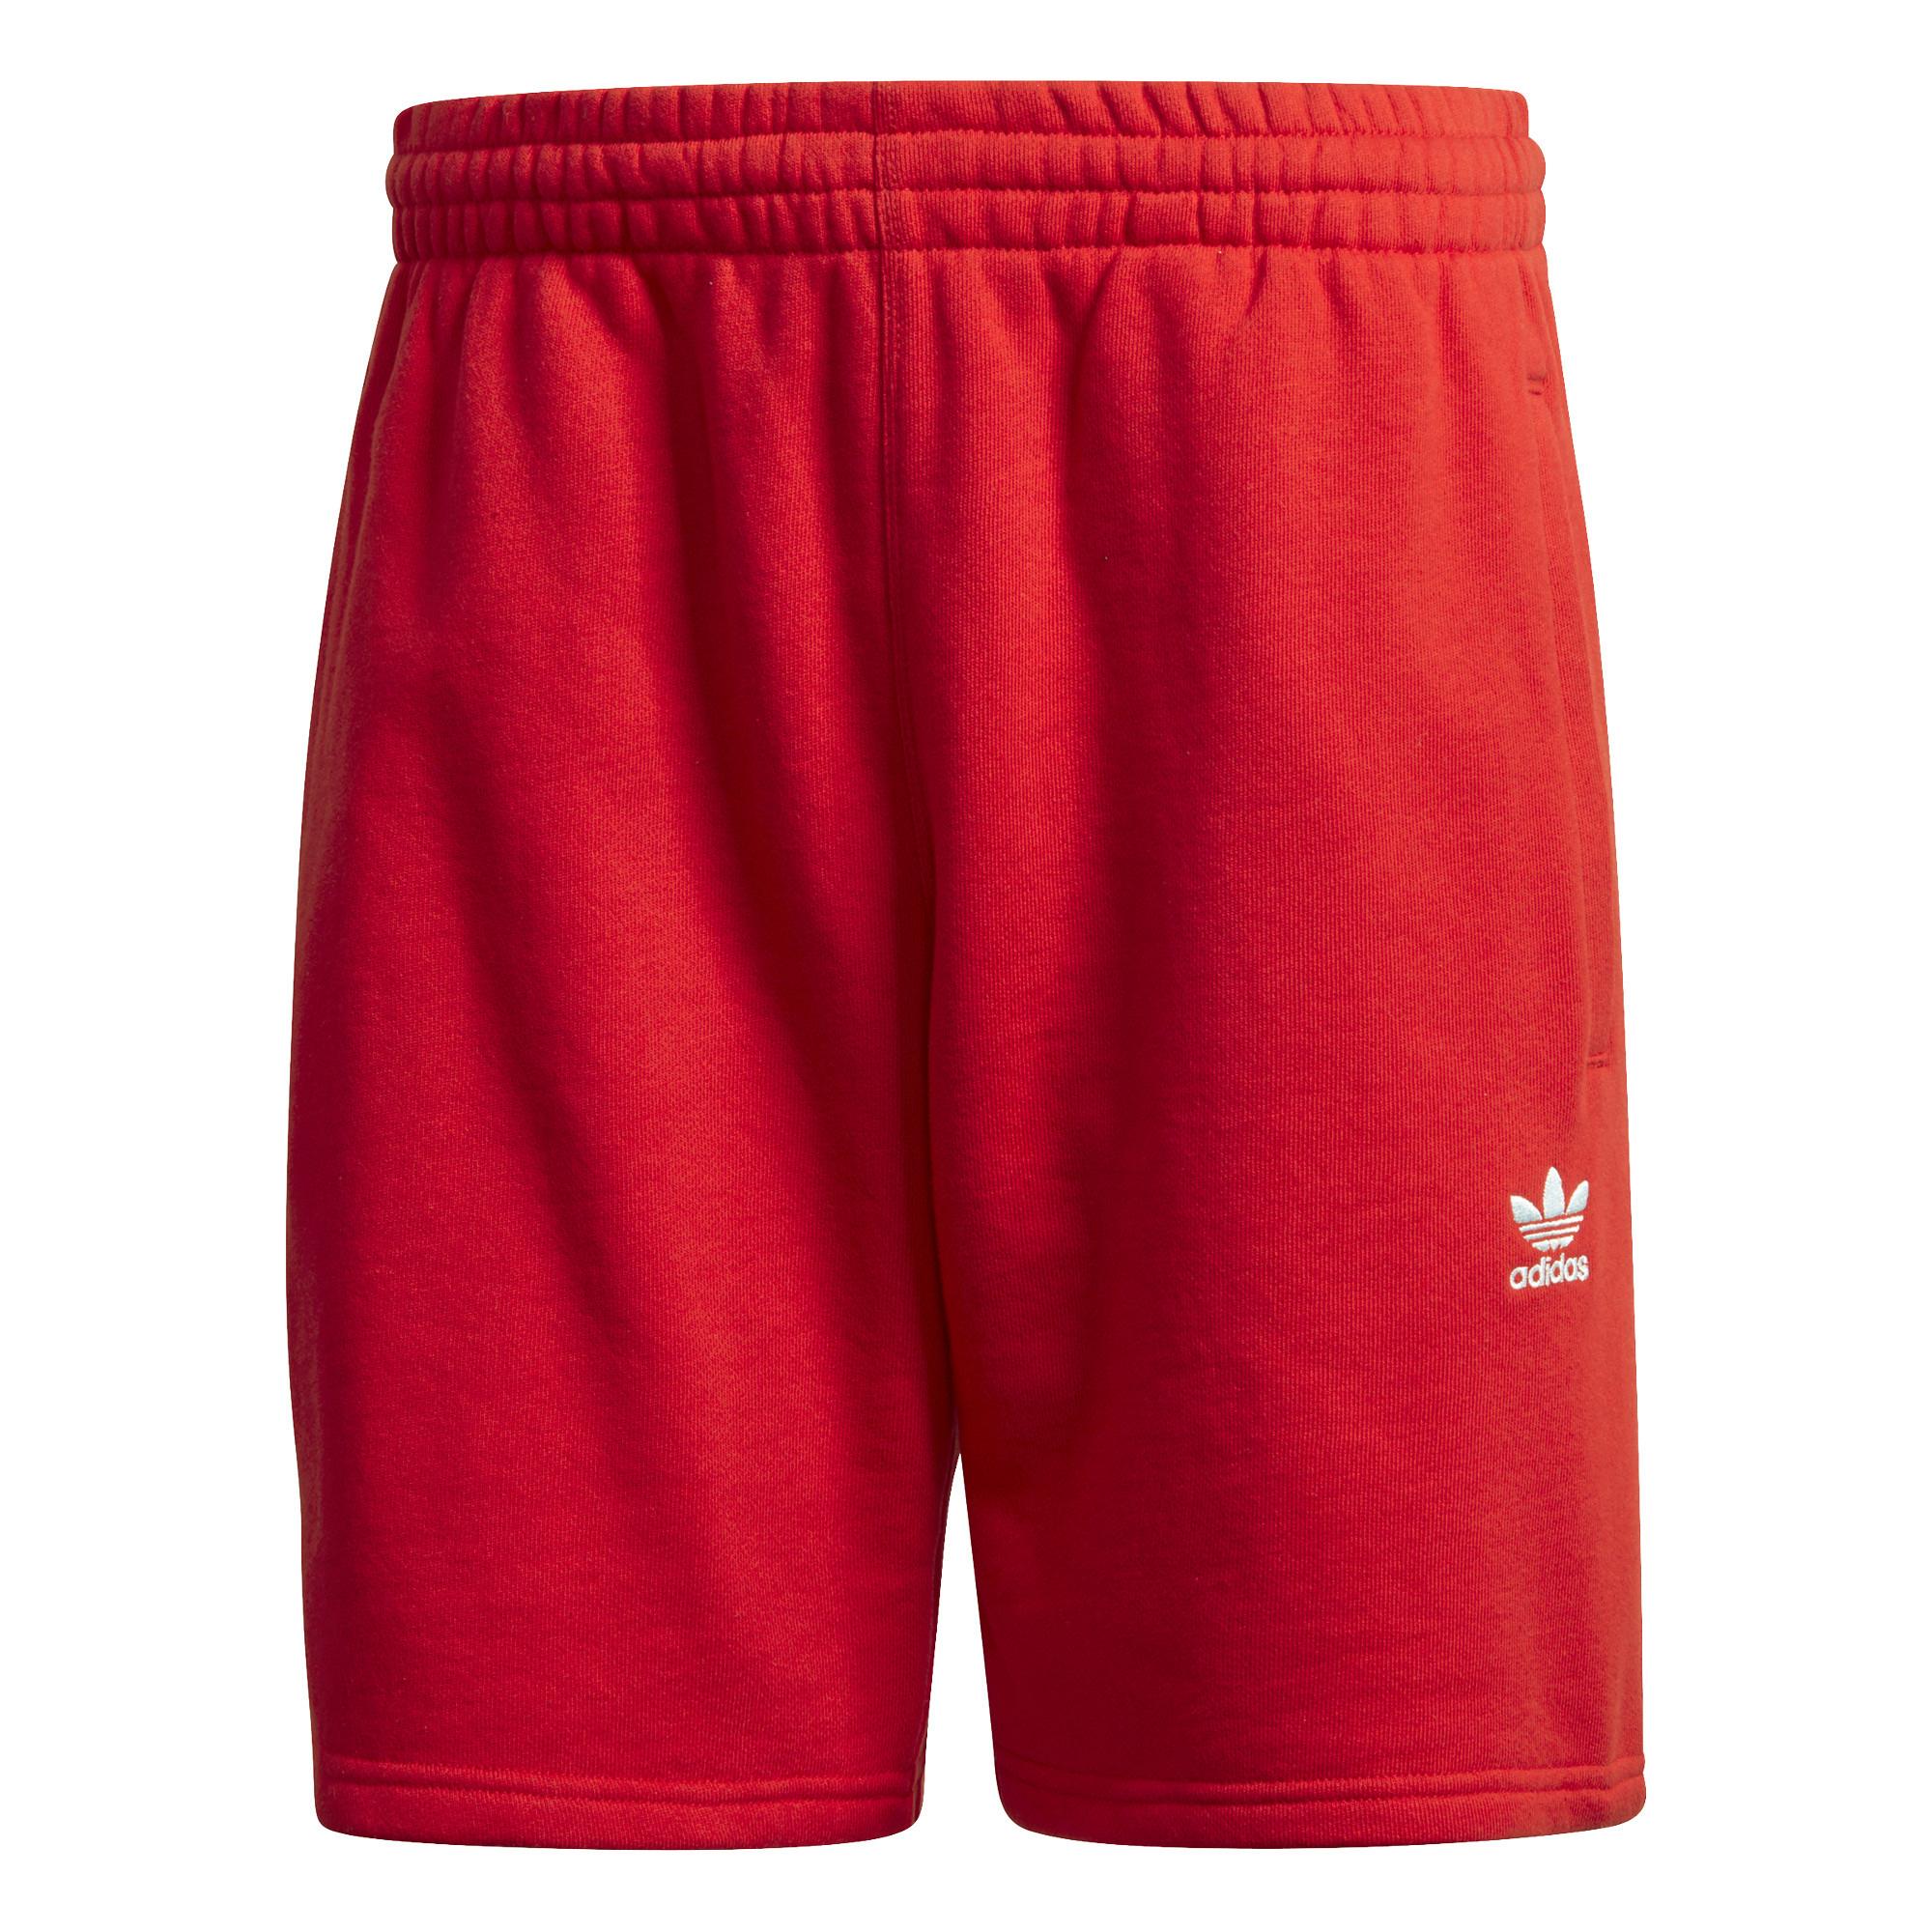 Short loungewear trefoil Essentials, Rosso, large image number 0